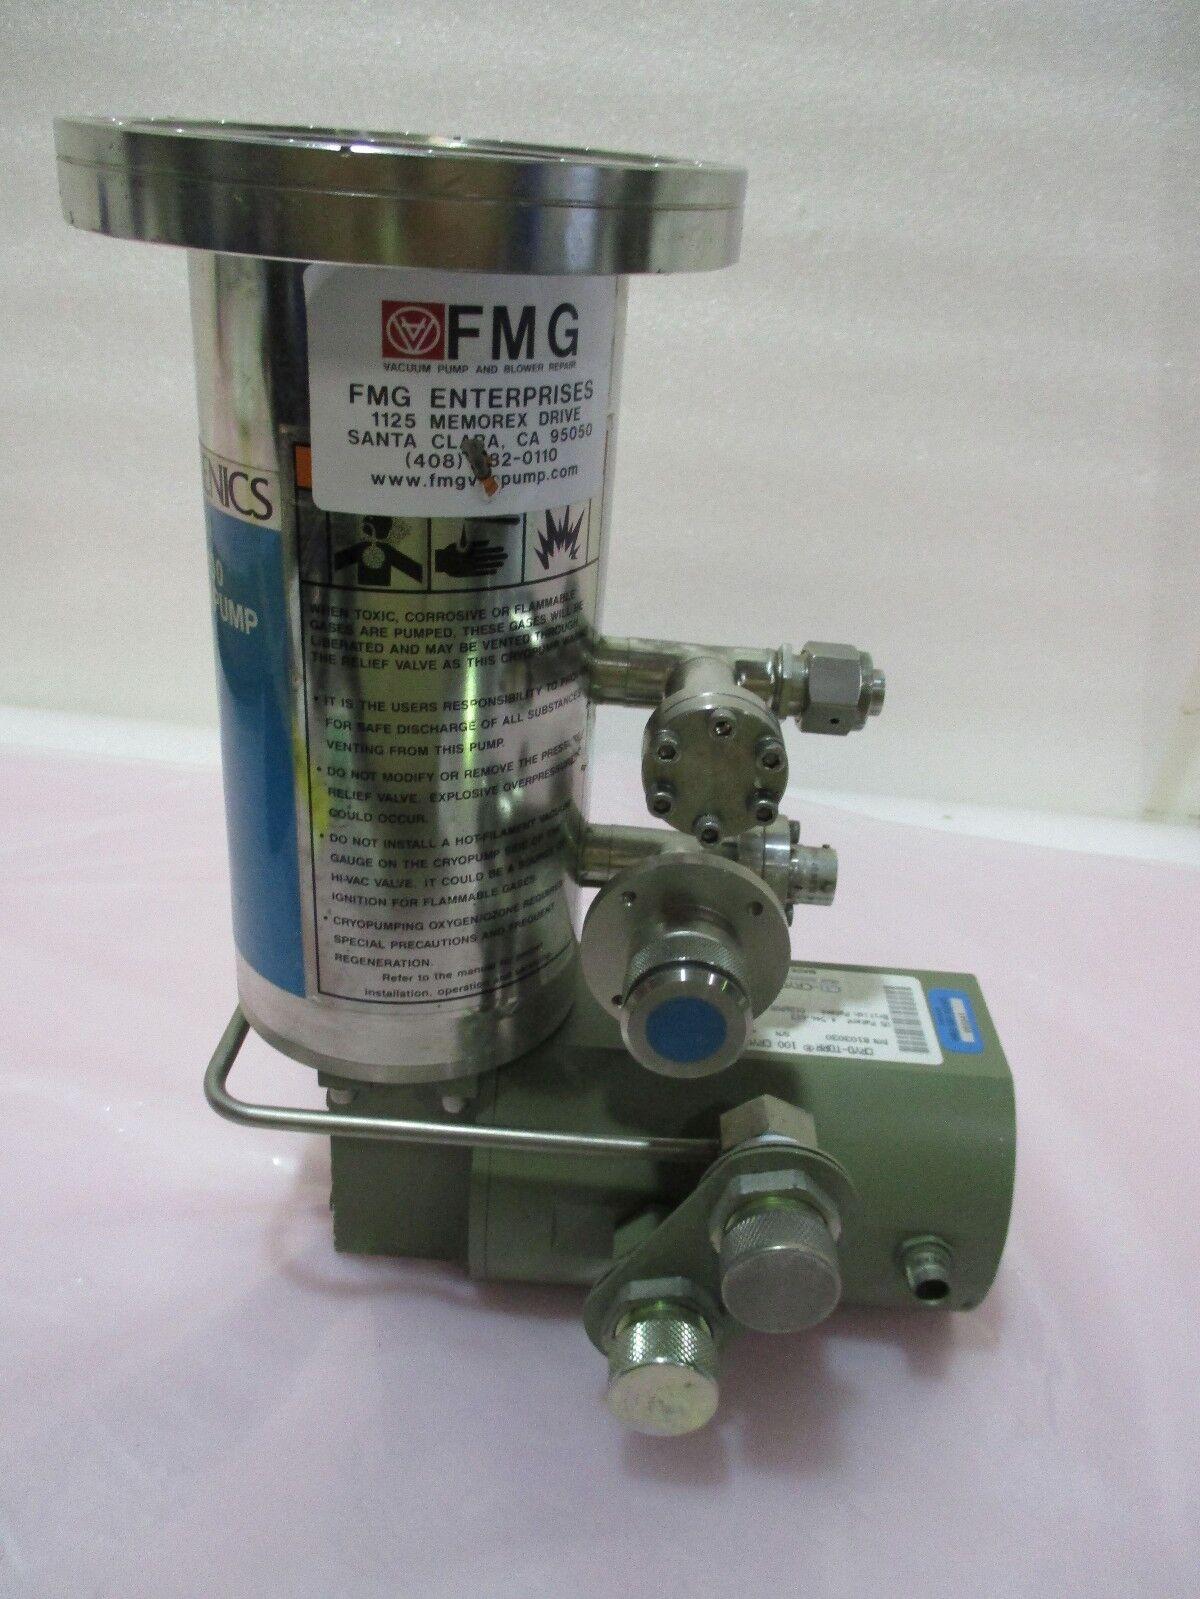 CTI-Cryogenics 8103030 Cryo-Torr, 100 High Vacuum Pump, Helix, Cryopump, 420717